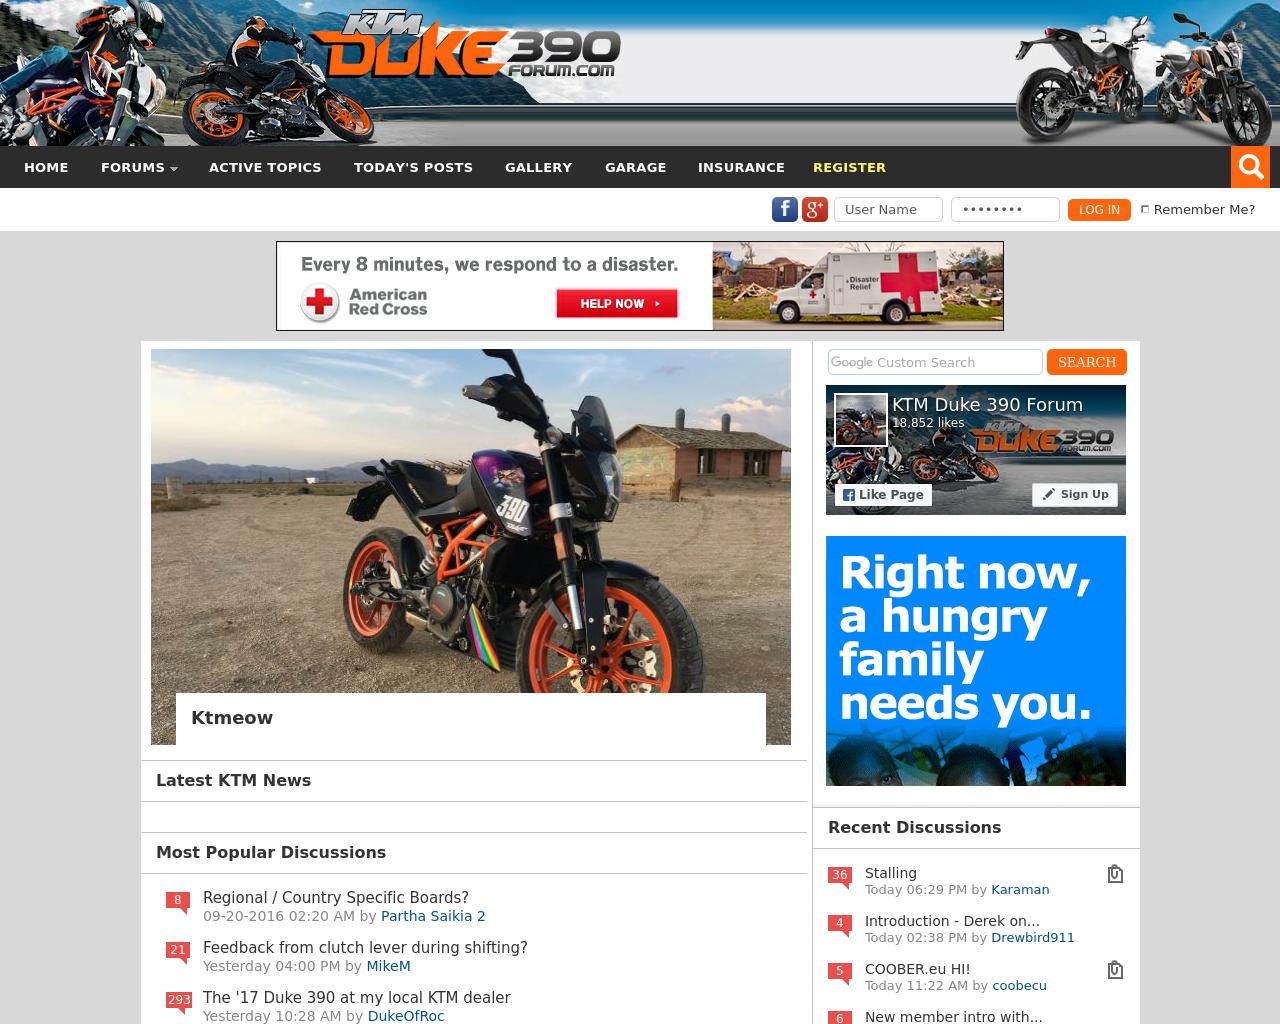 KTM-Duke-390-Forum-Advertising-Reviews-Pricing